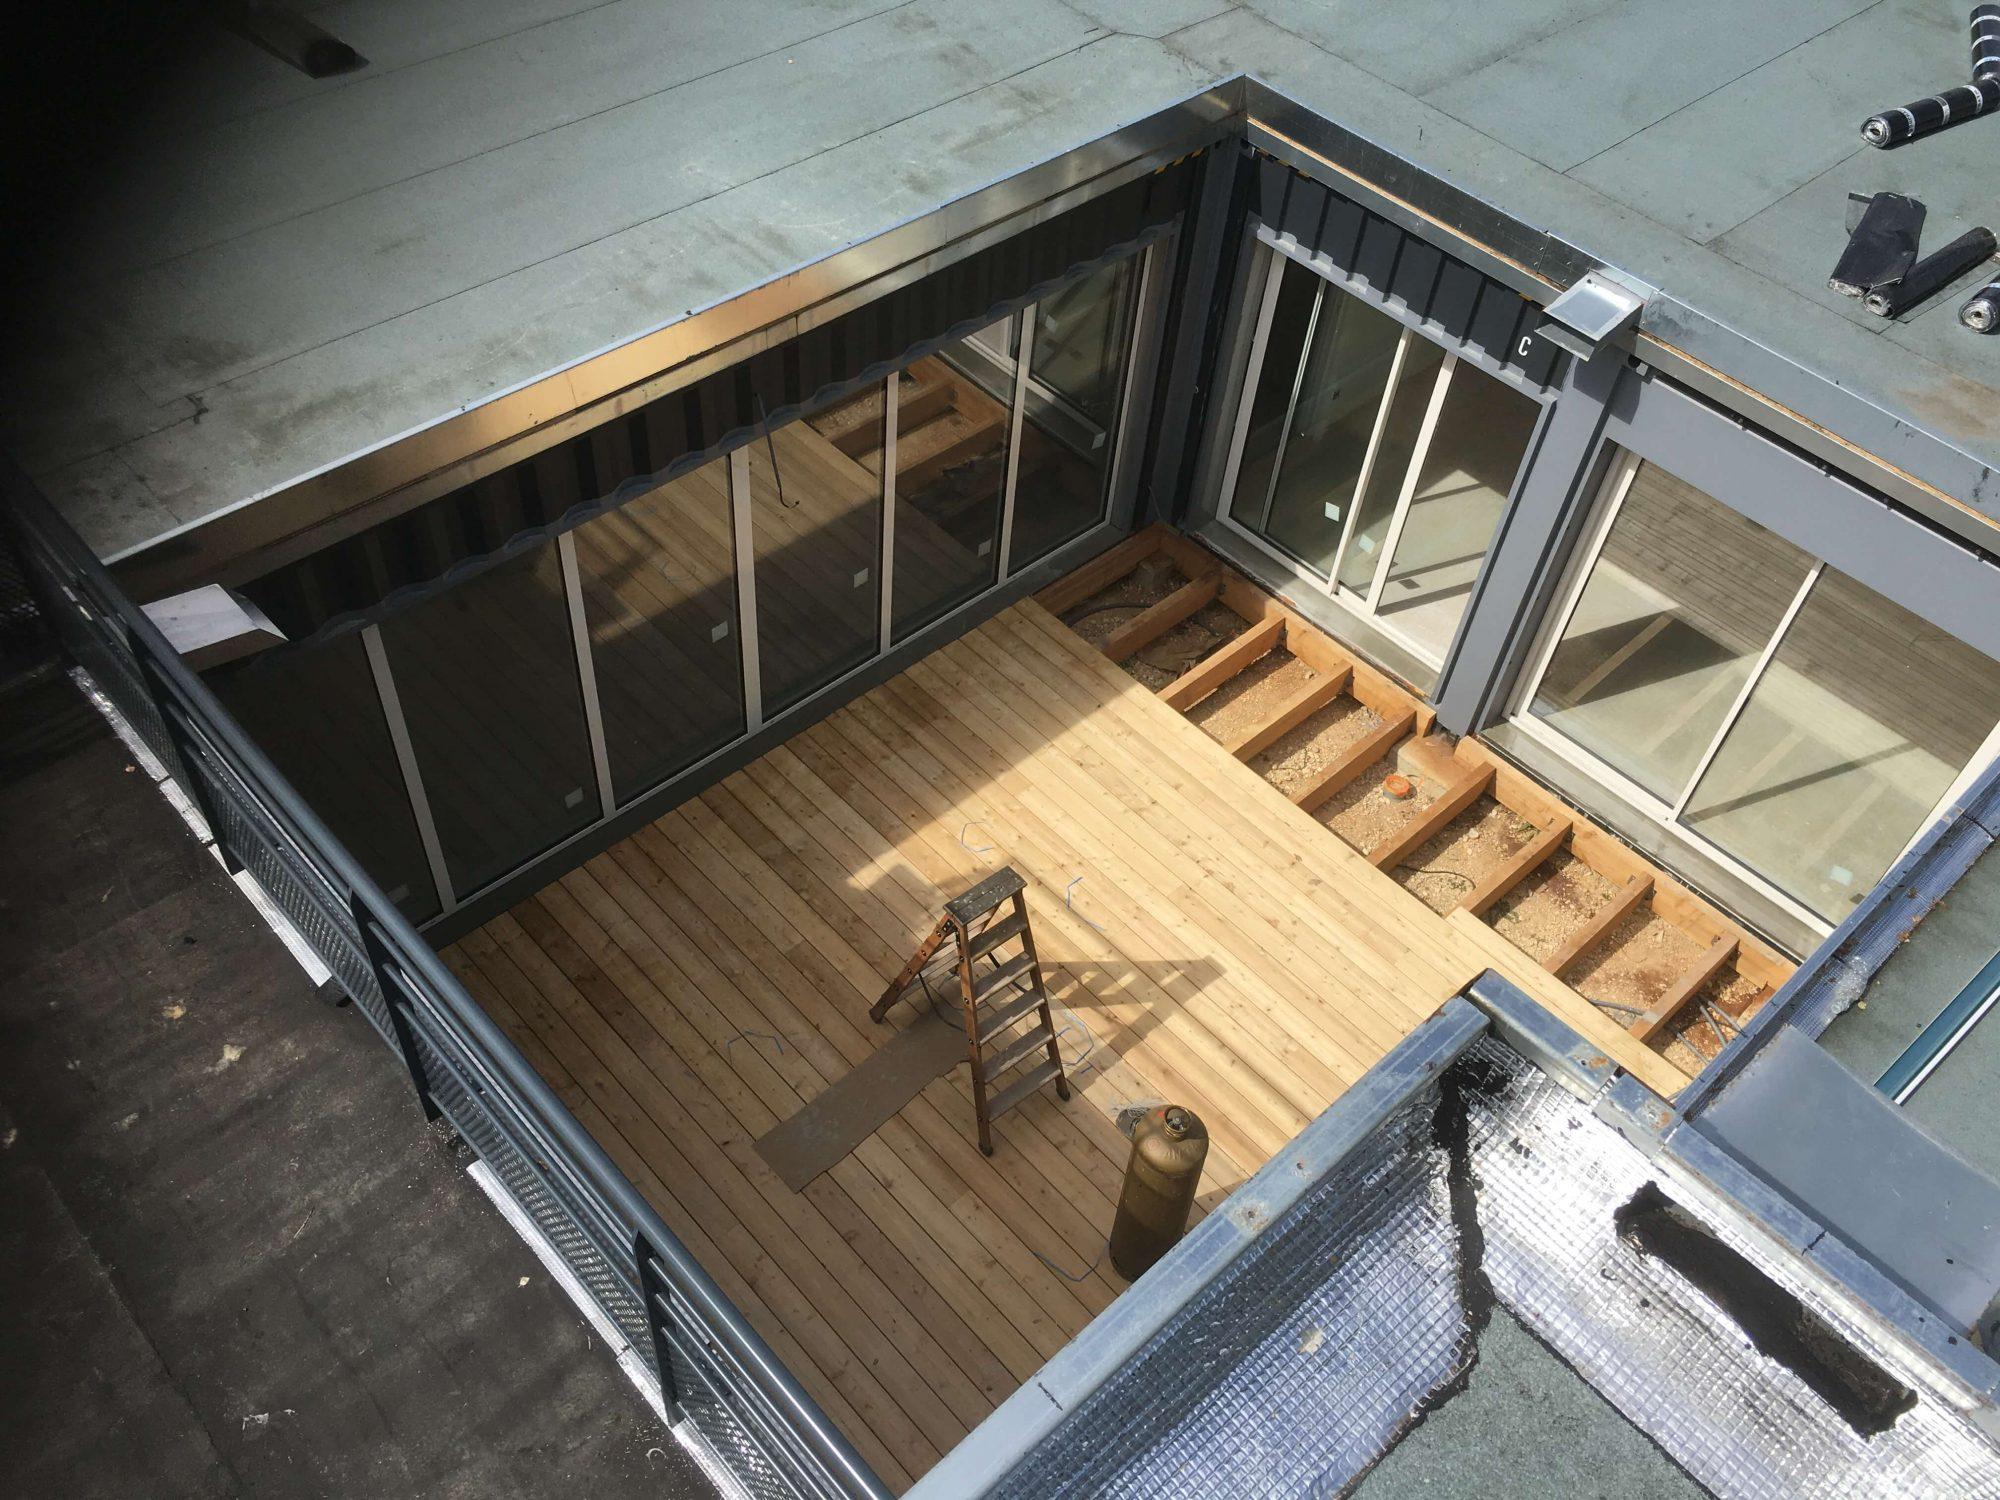 interieur-container-amenage